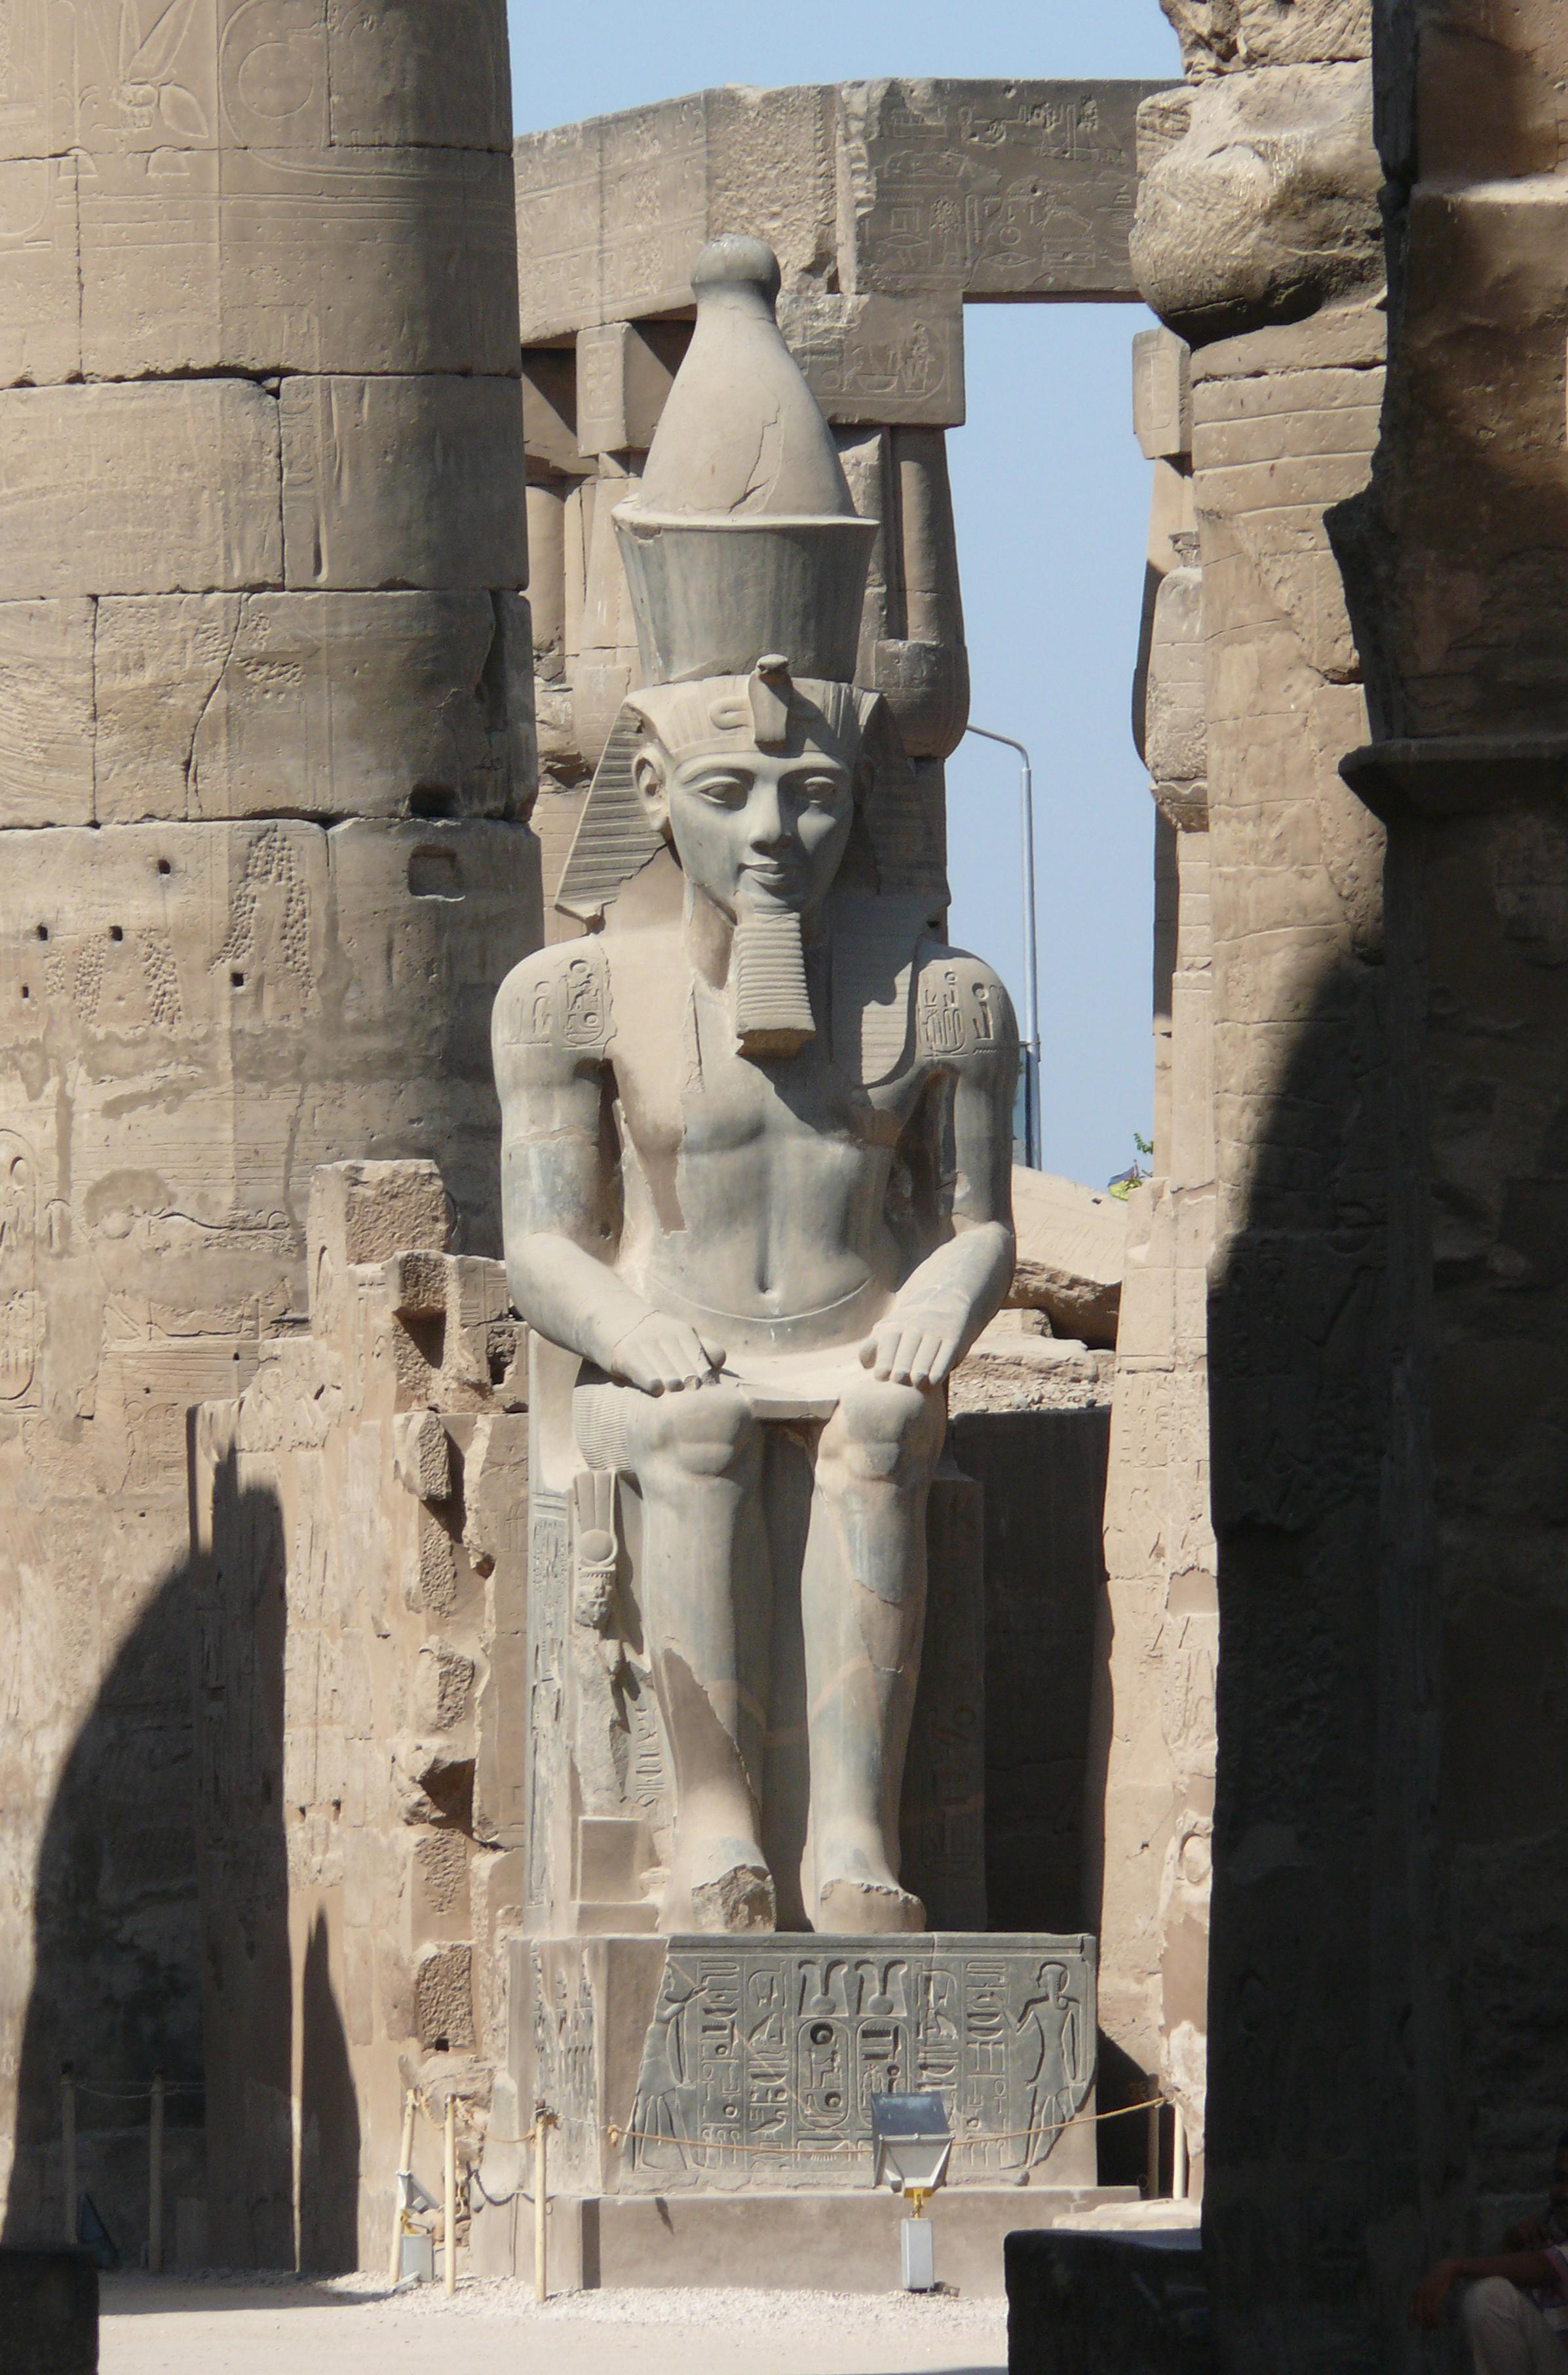 Description Ramses Ii at Luxor temple JPG